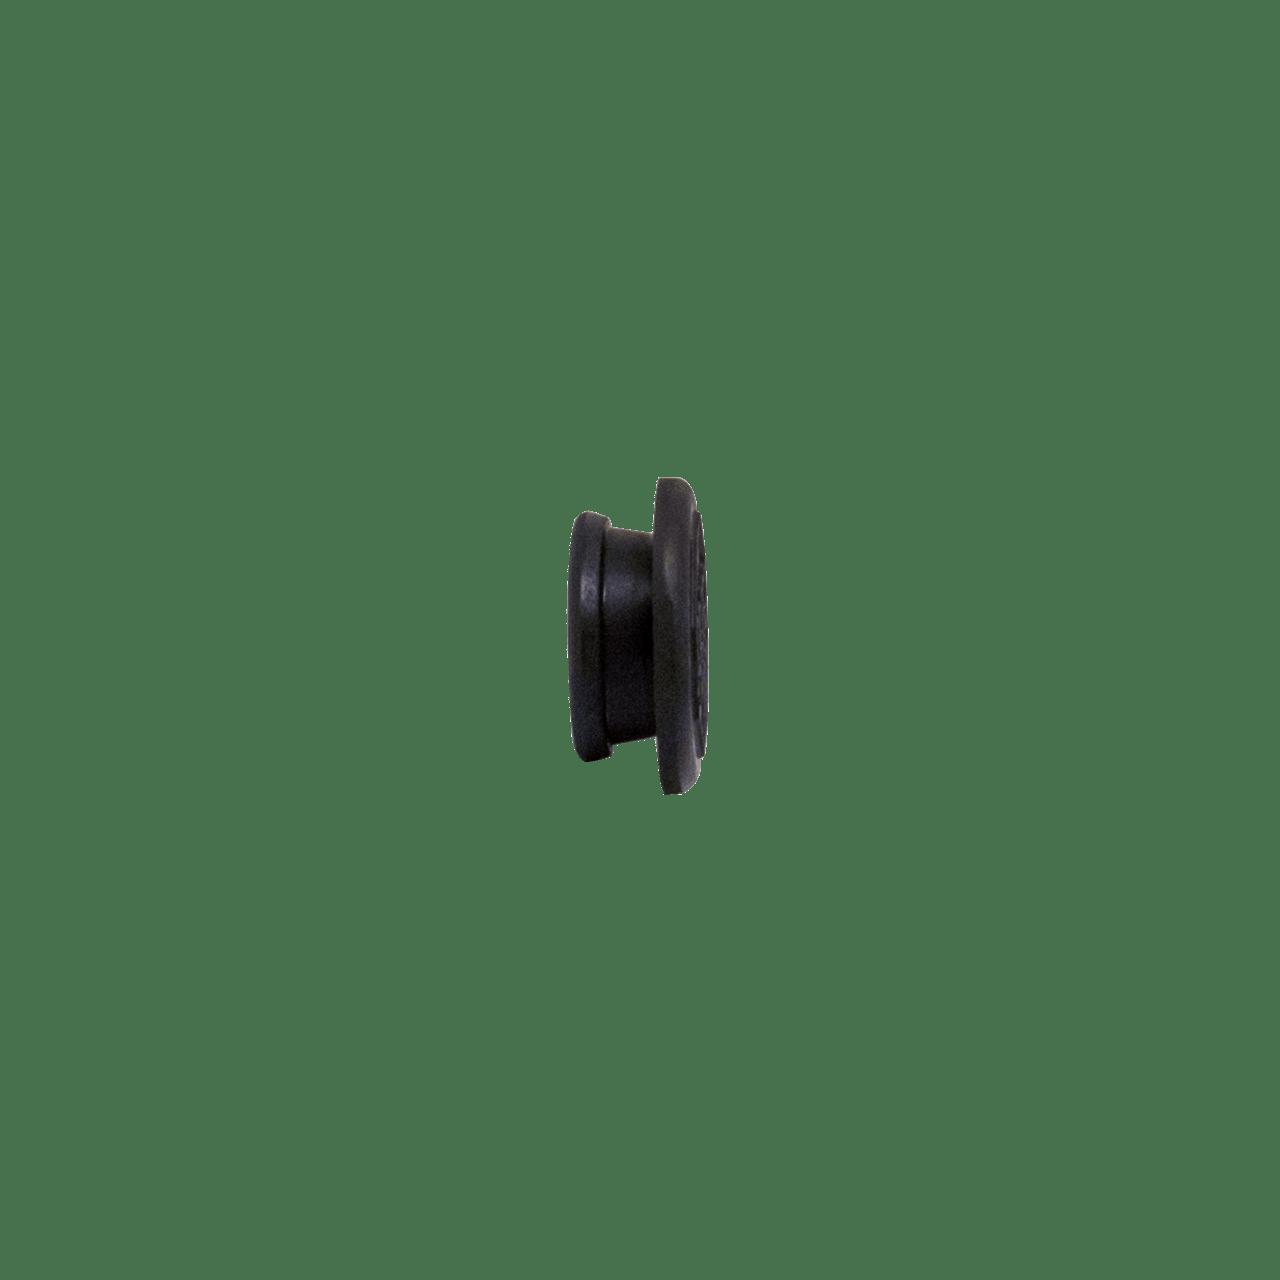 92126 --- Oil Cap Rubber Plug - Hayes